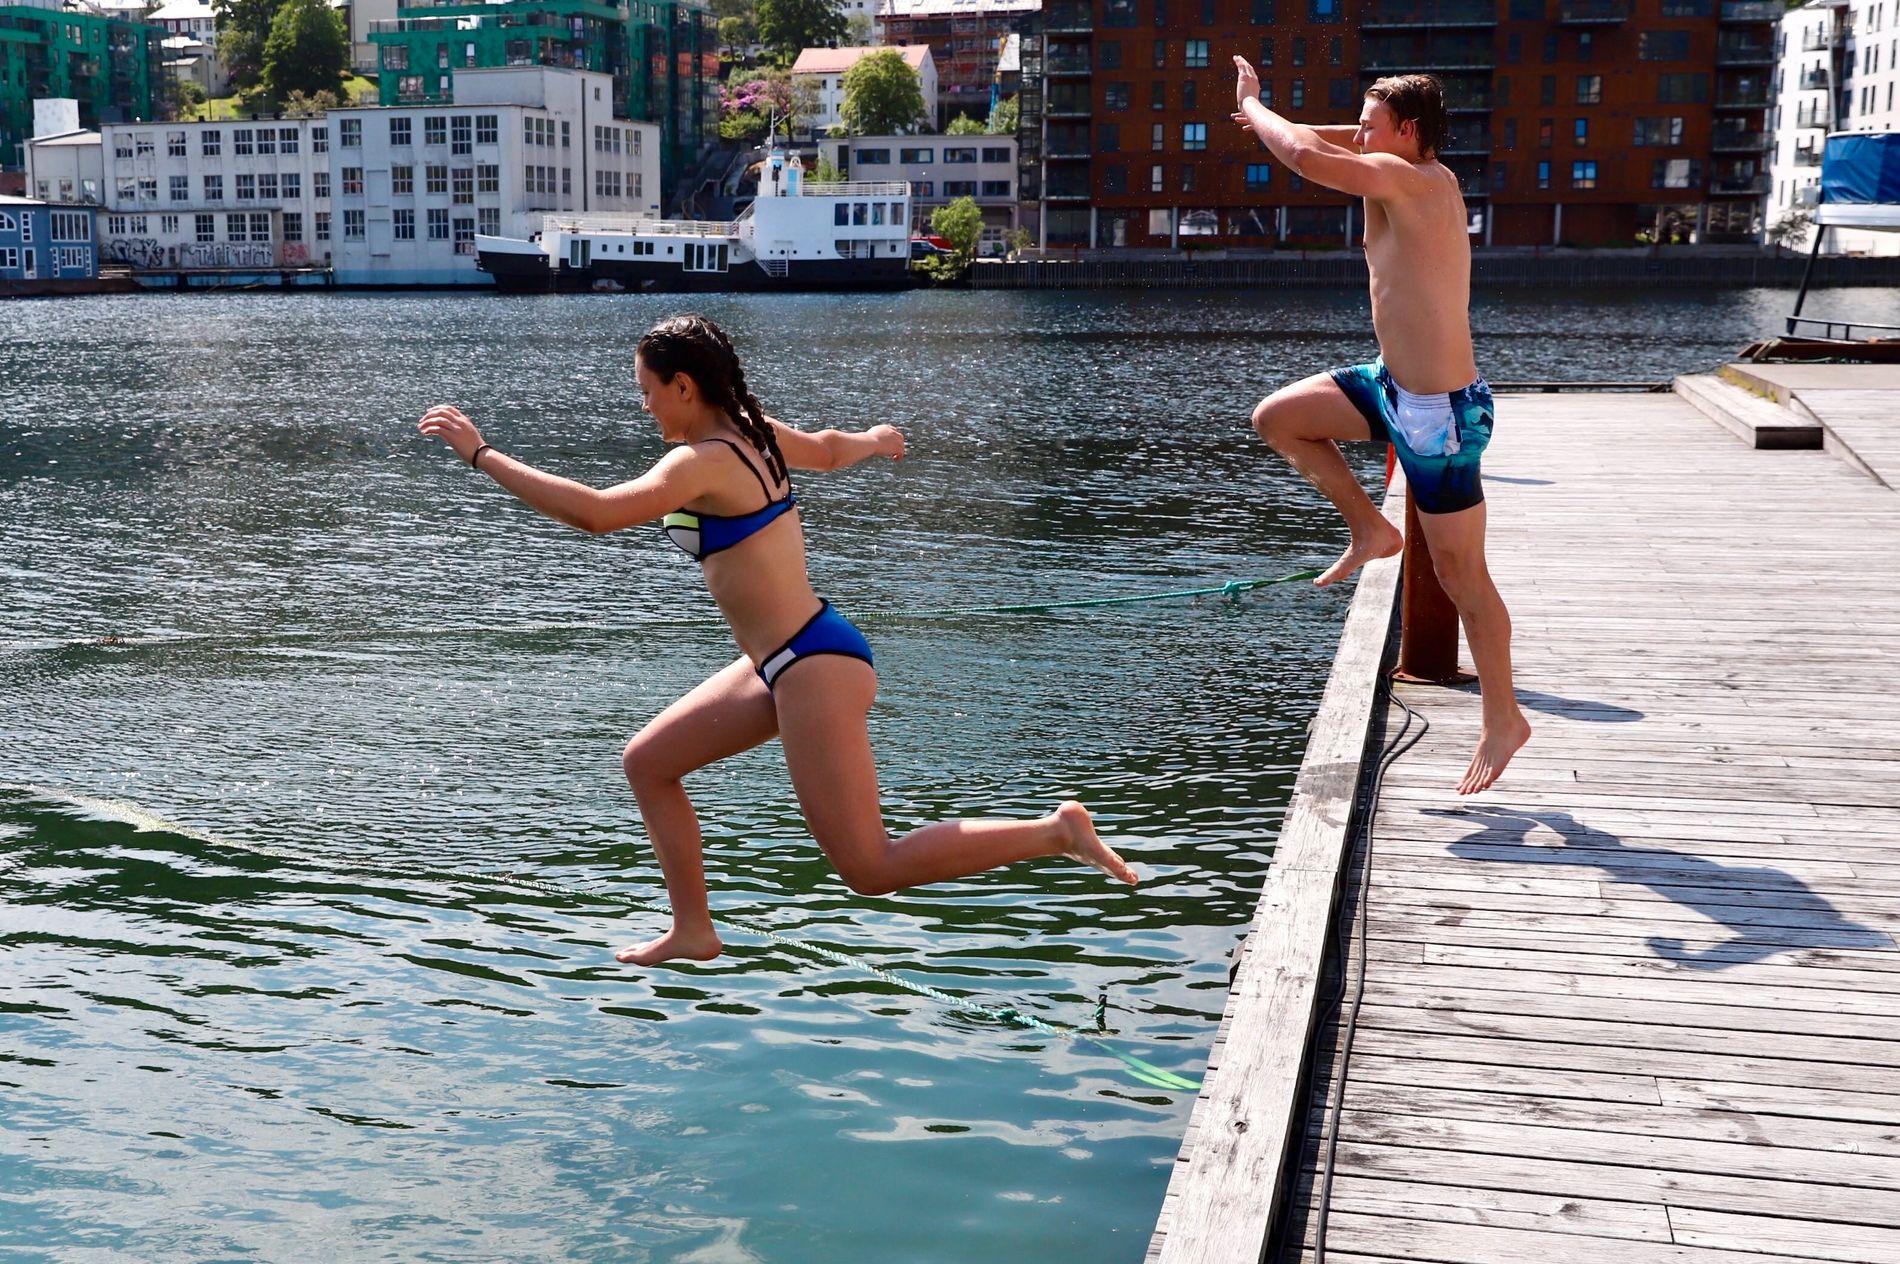 VARMT: Til helgen kan det bli så varmt at badenymfer kan hoppe i havet.